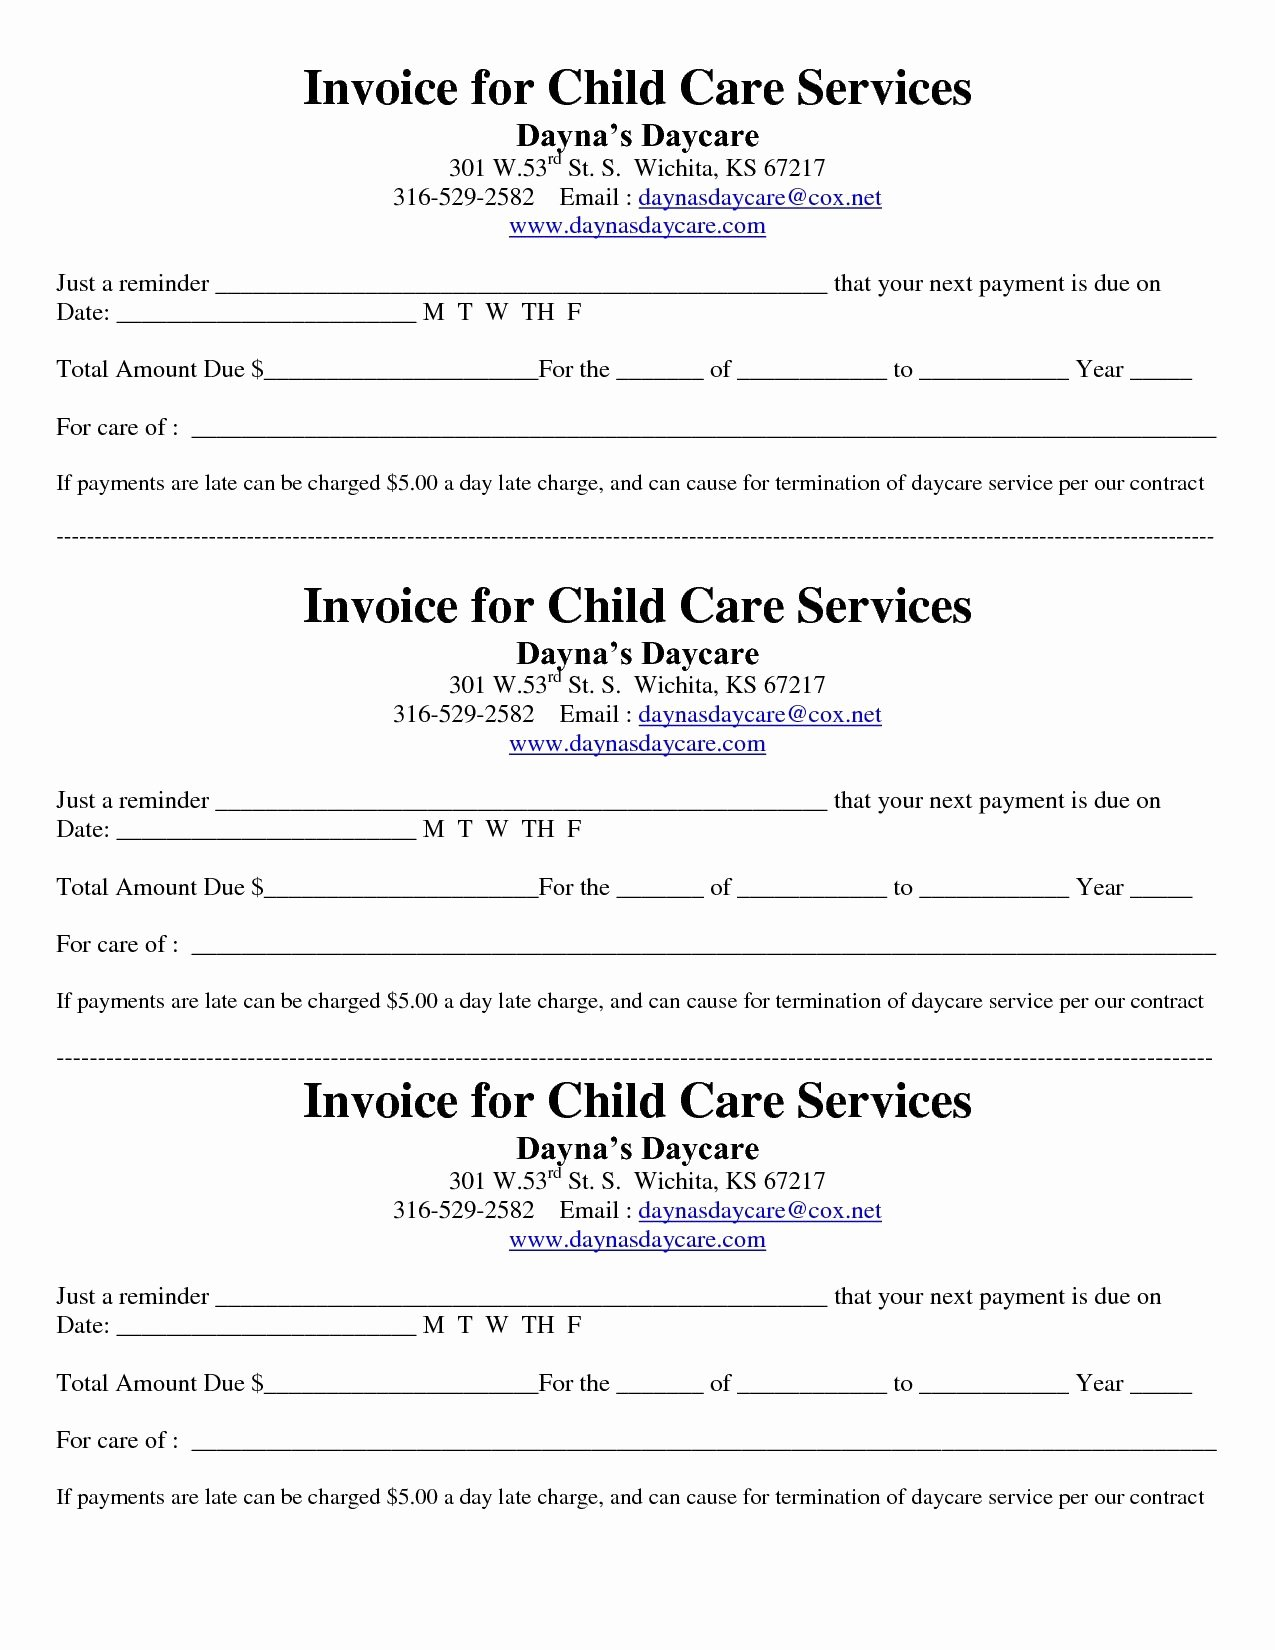 Child Care Receipts Template Beautiful Child Care Receipt Invoice